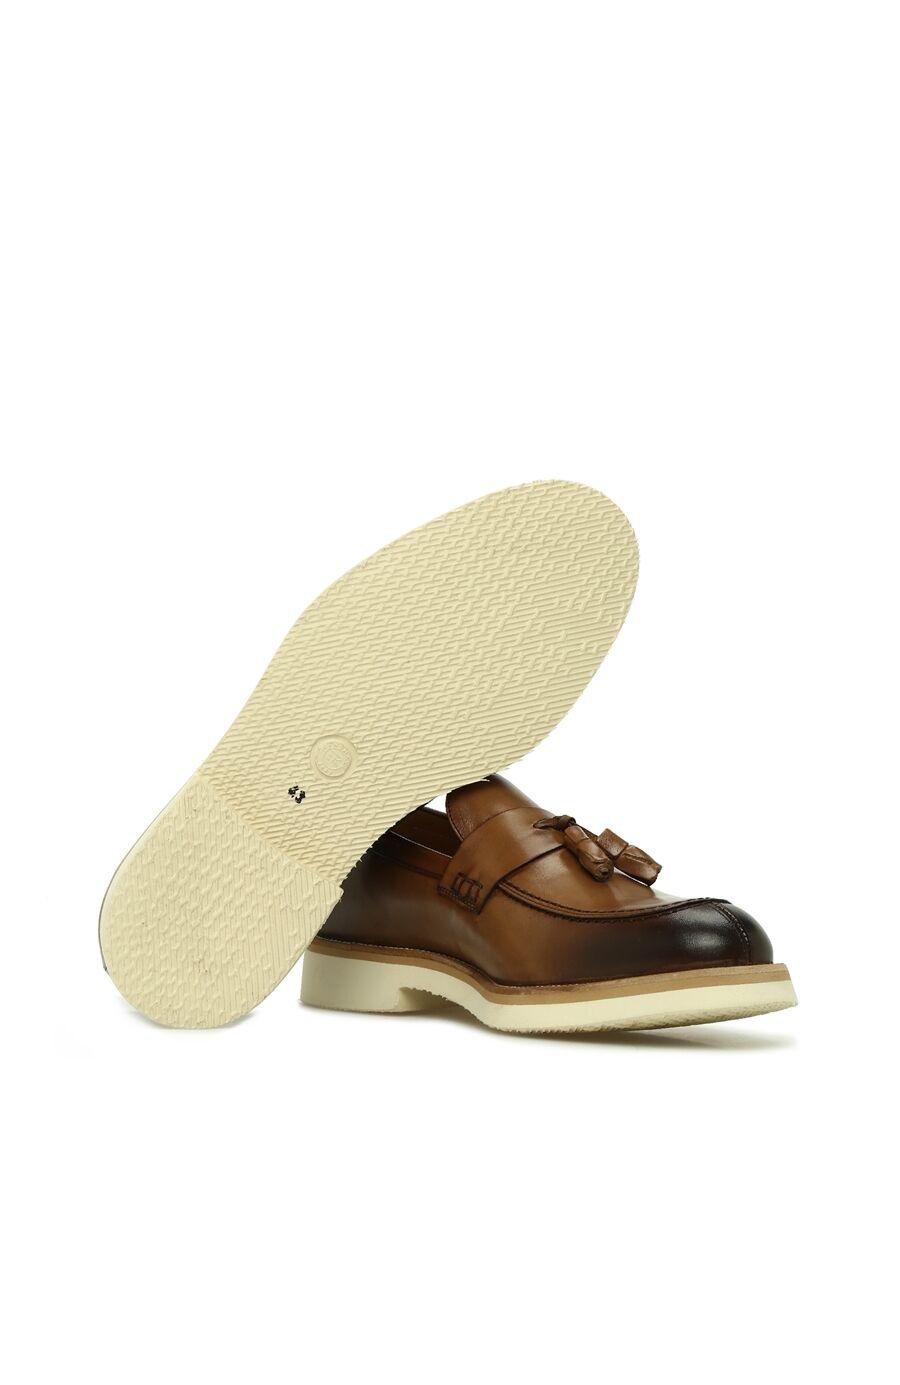 Ceviz Loafer